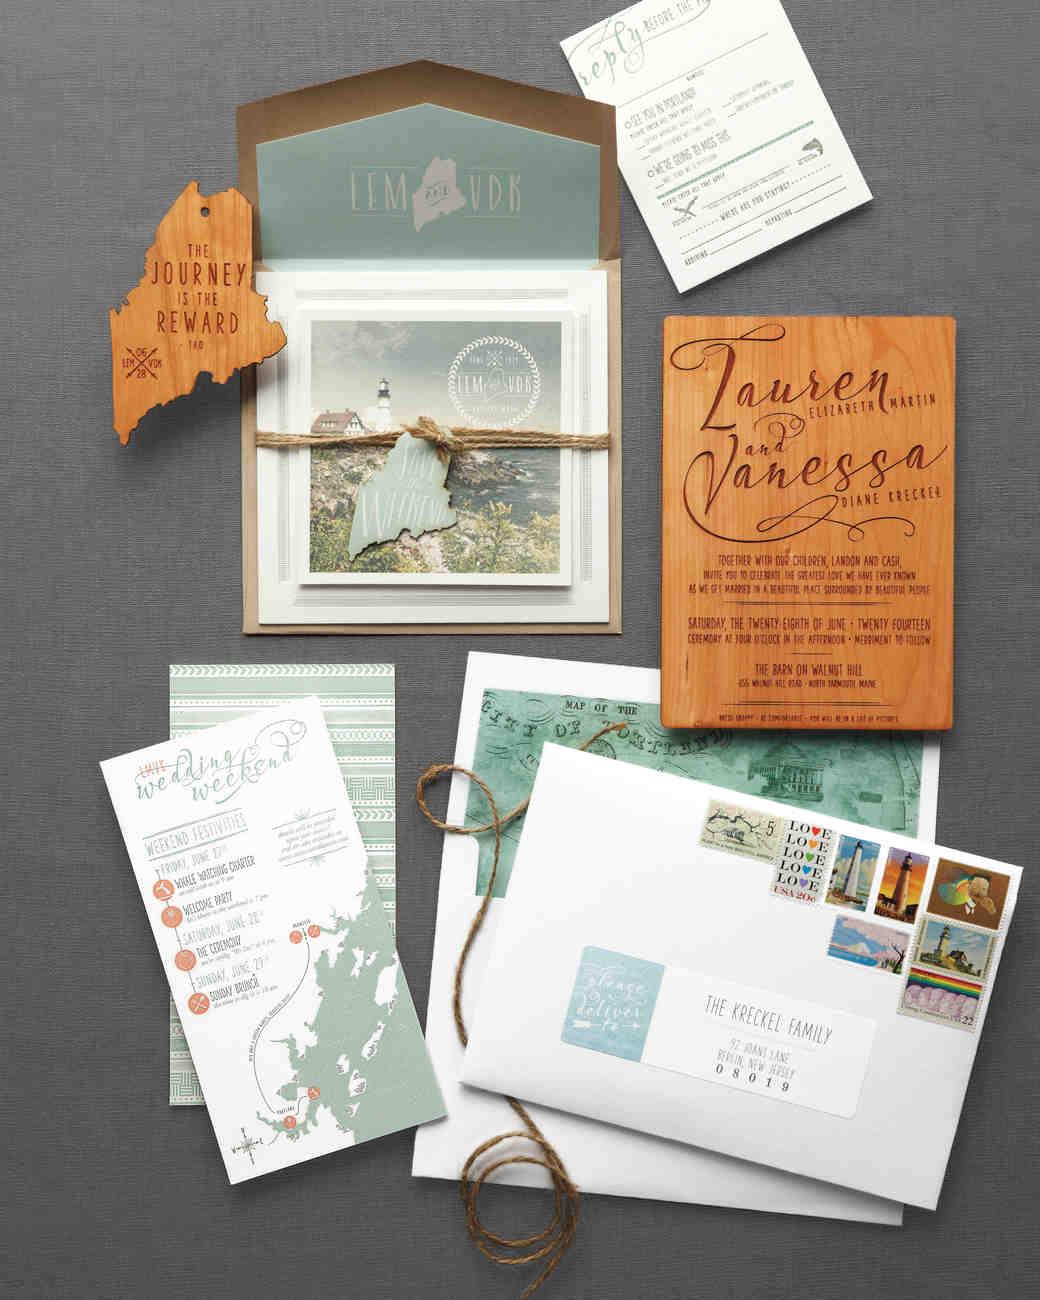 rustic wedding invitations wedding invitation suites 46 Elevated Ideas for Your Rustic Wedding Invitations Martha Stewart Weddings